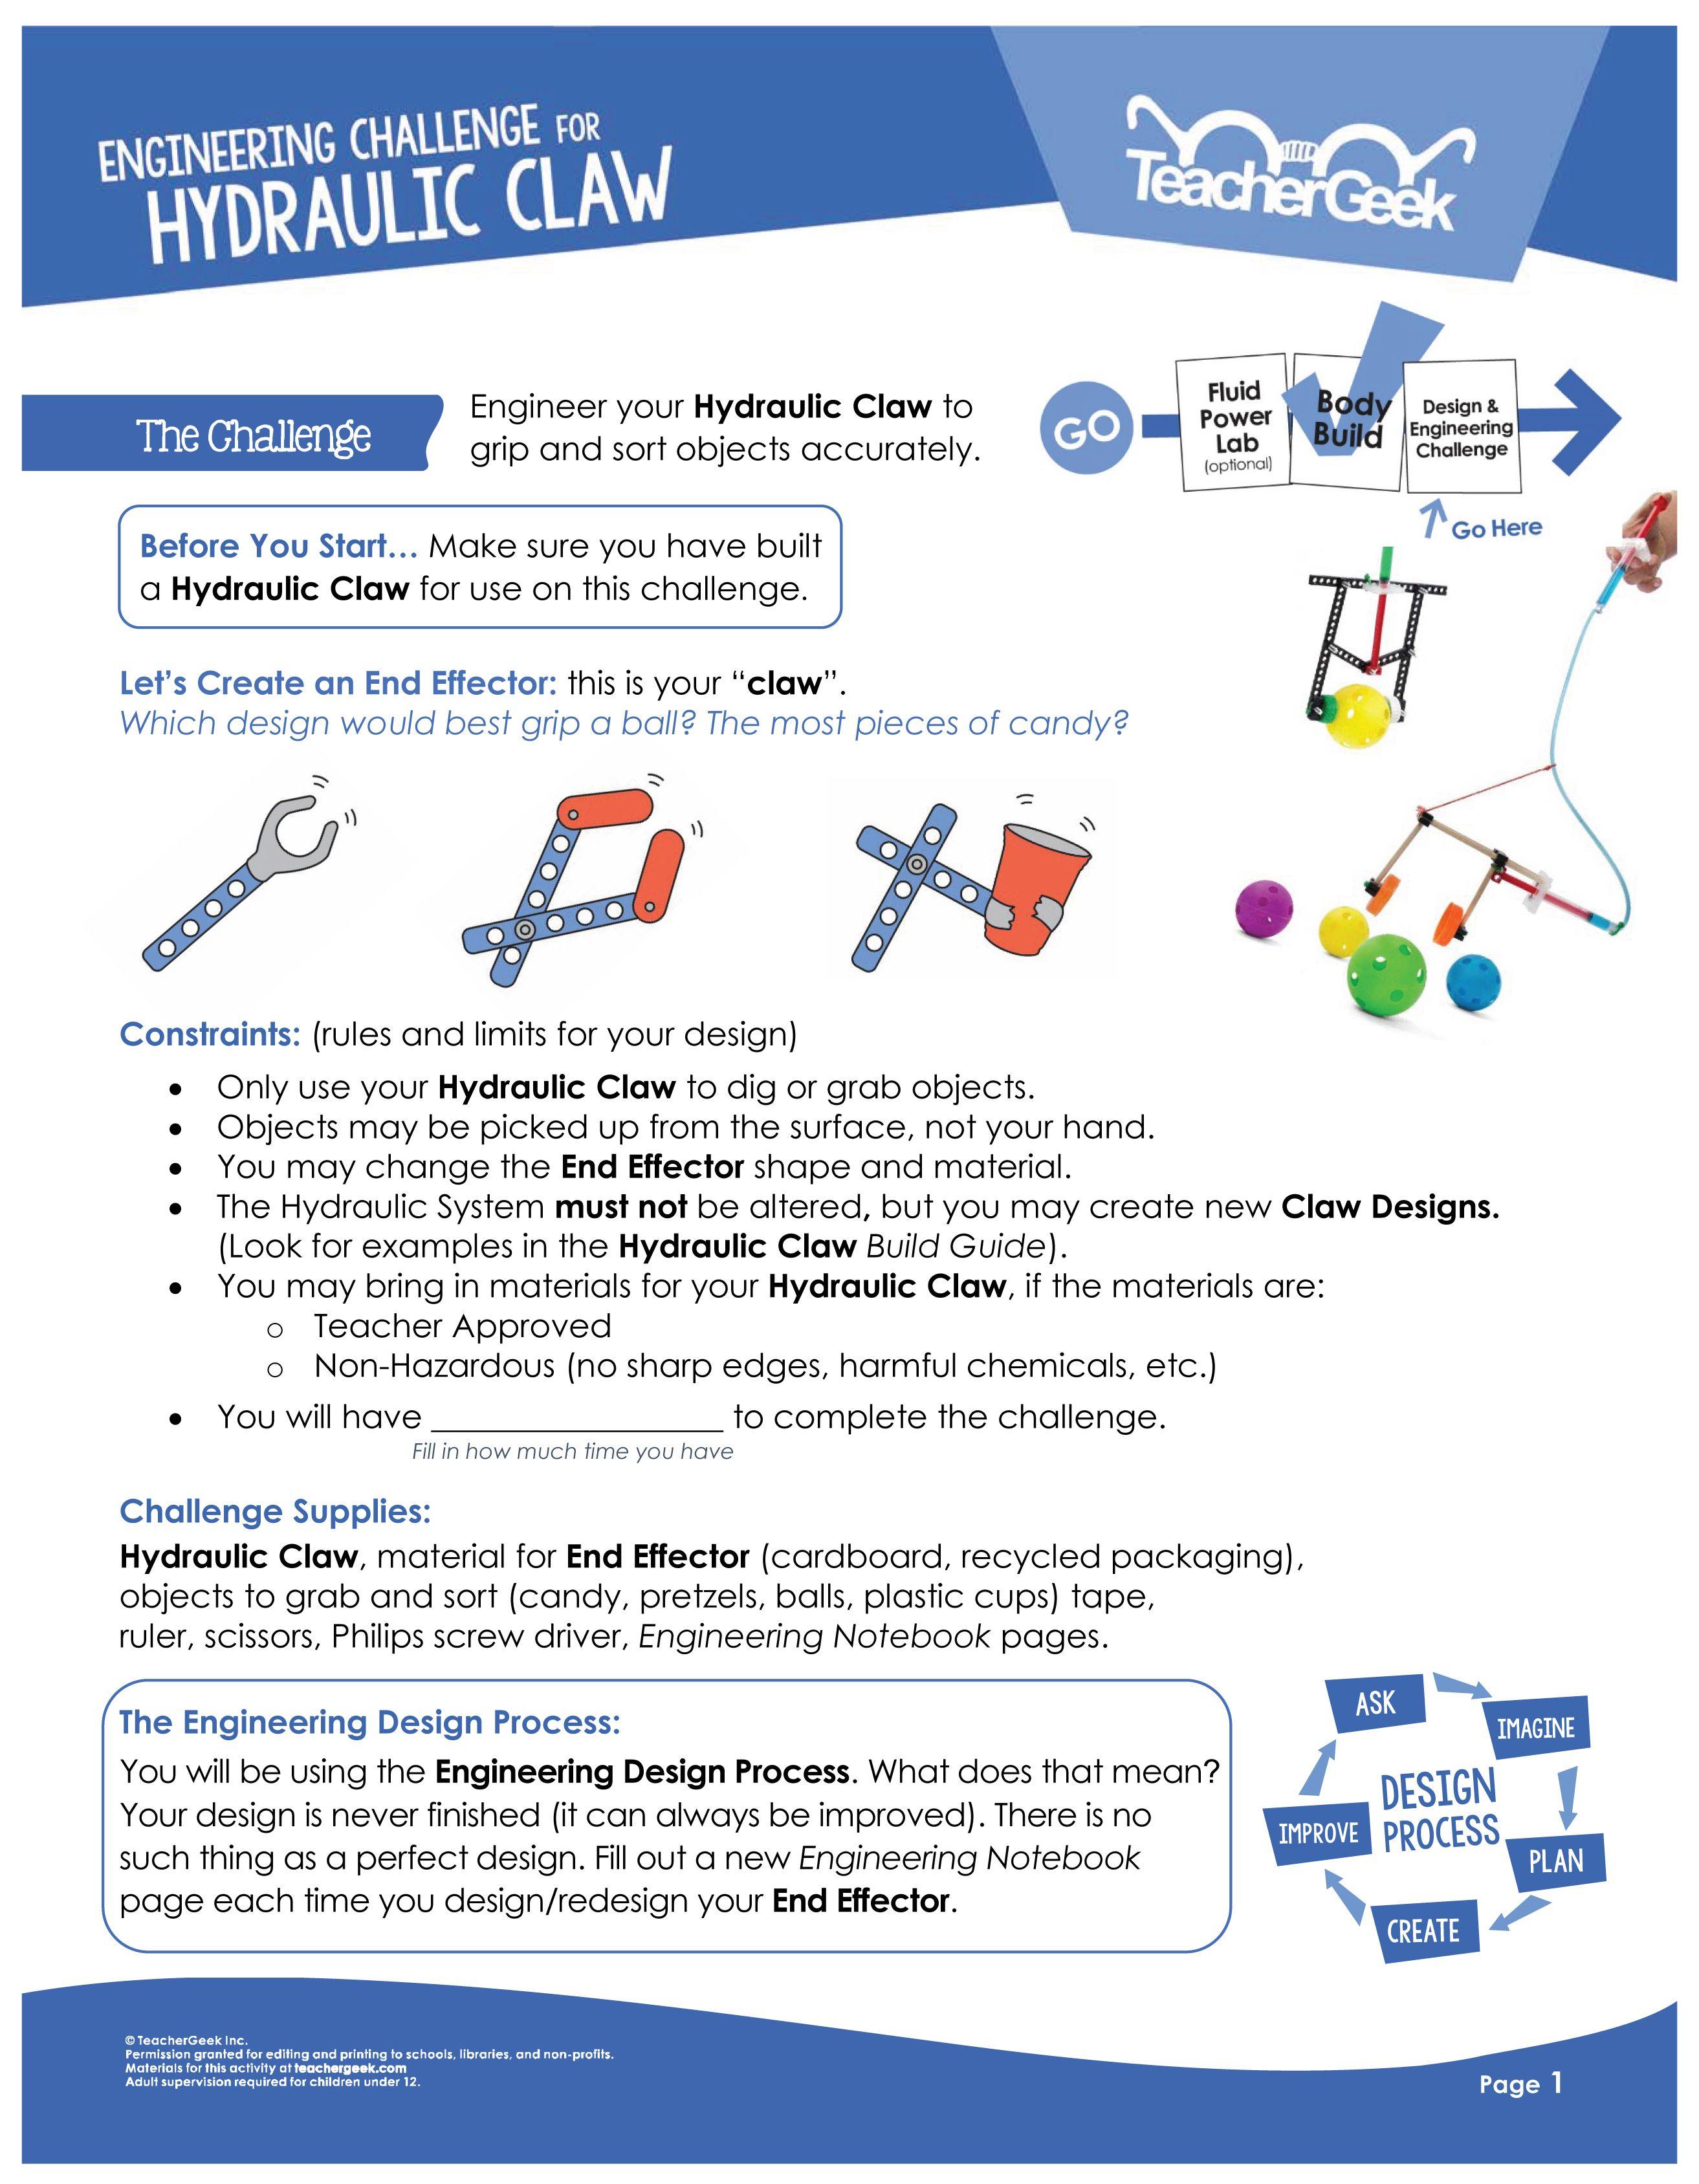 34 Engineering Design Process Worksheet Middle School